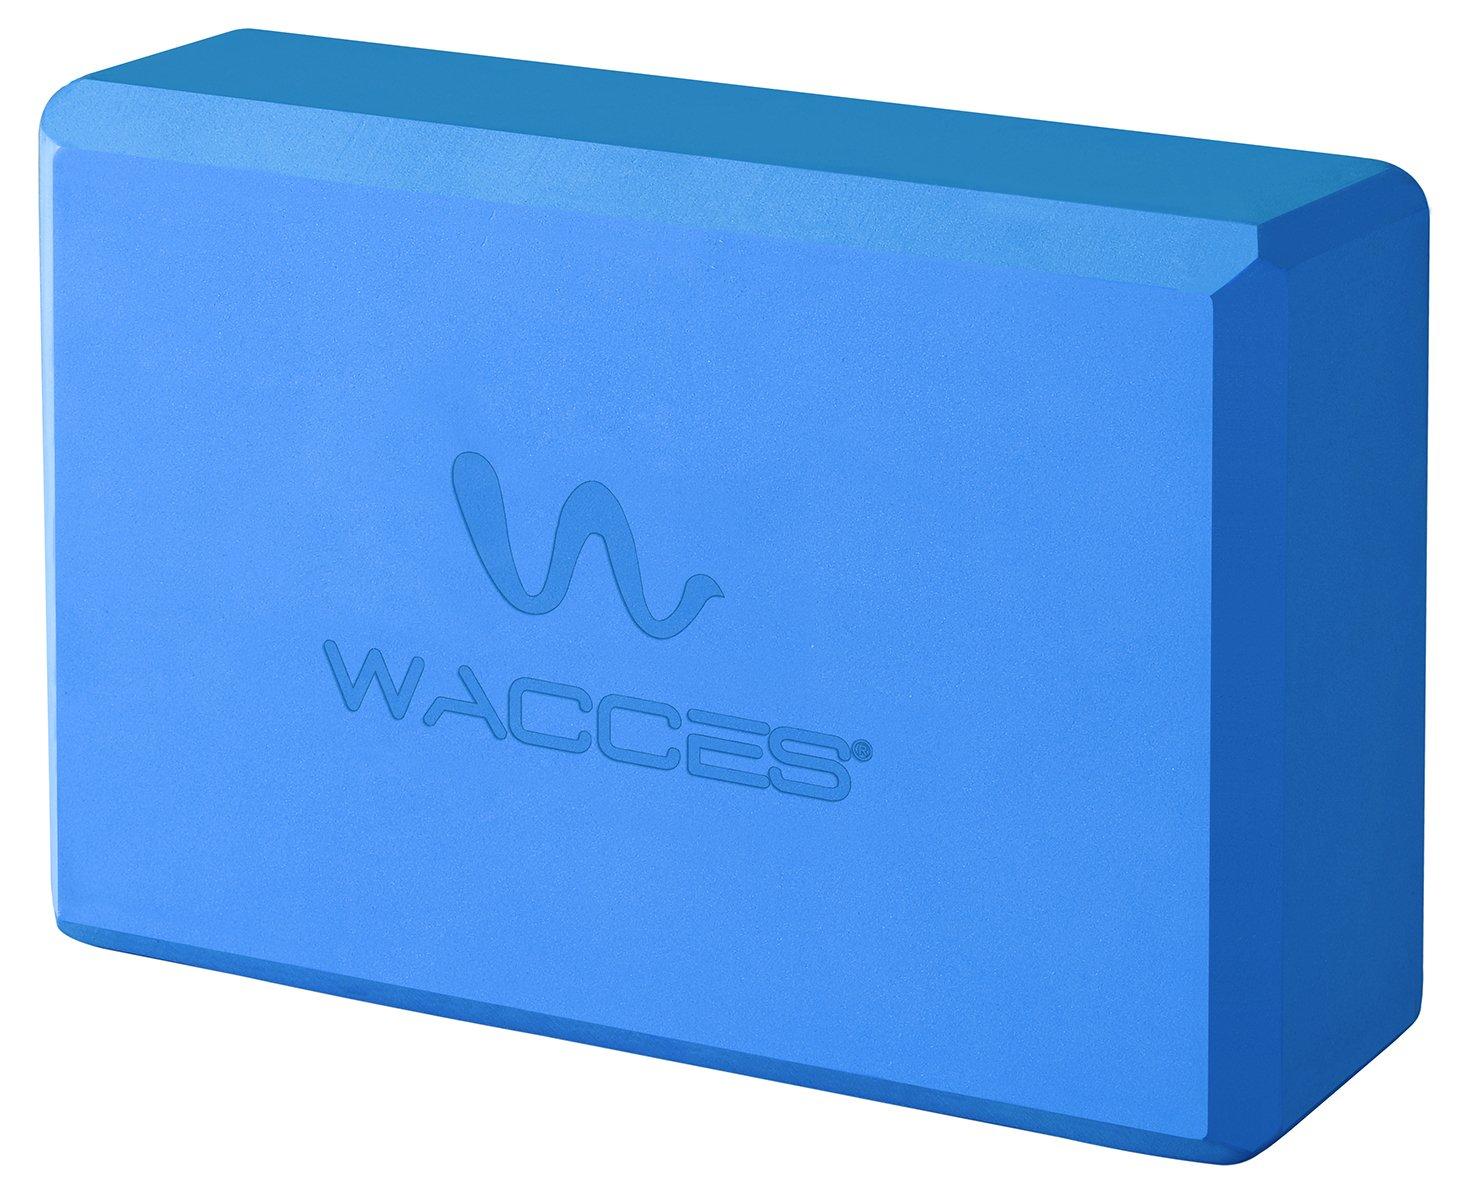 Set of 2 Wacces Foam Exercise Fitness /& Yoga Blocks